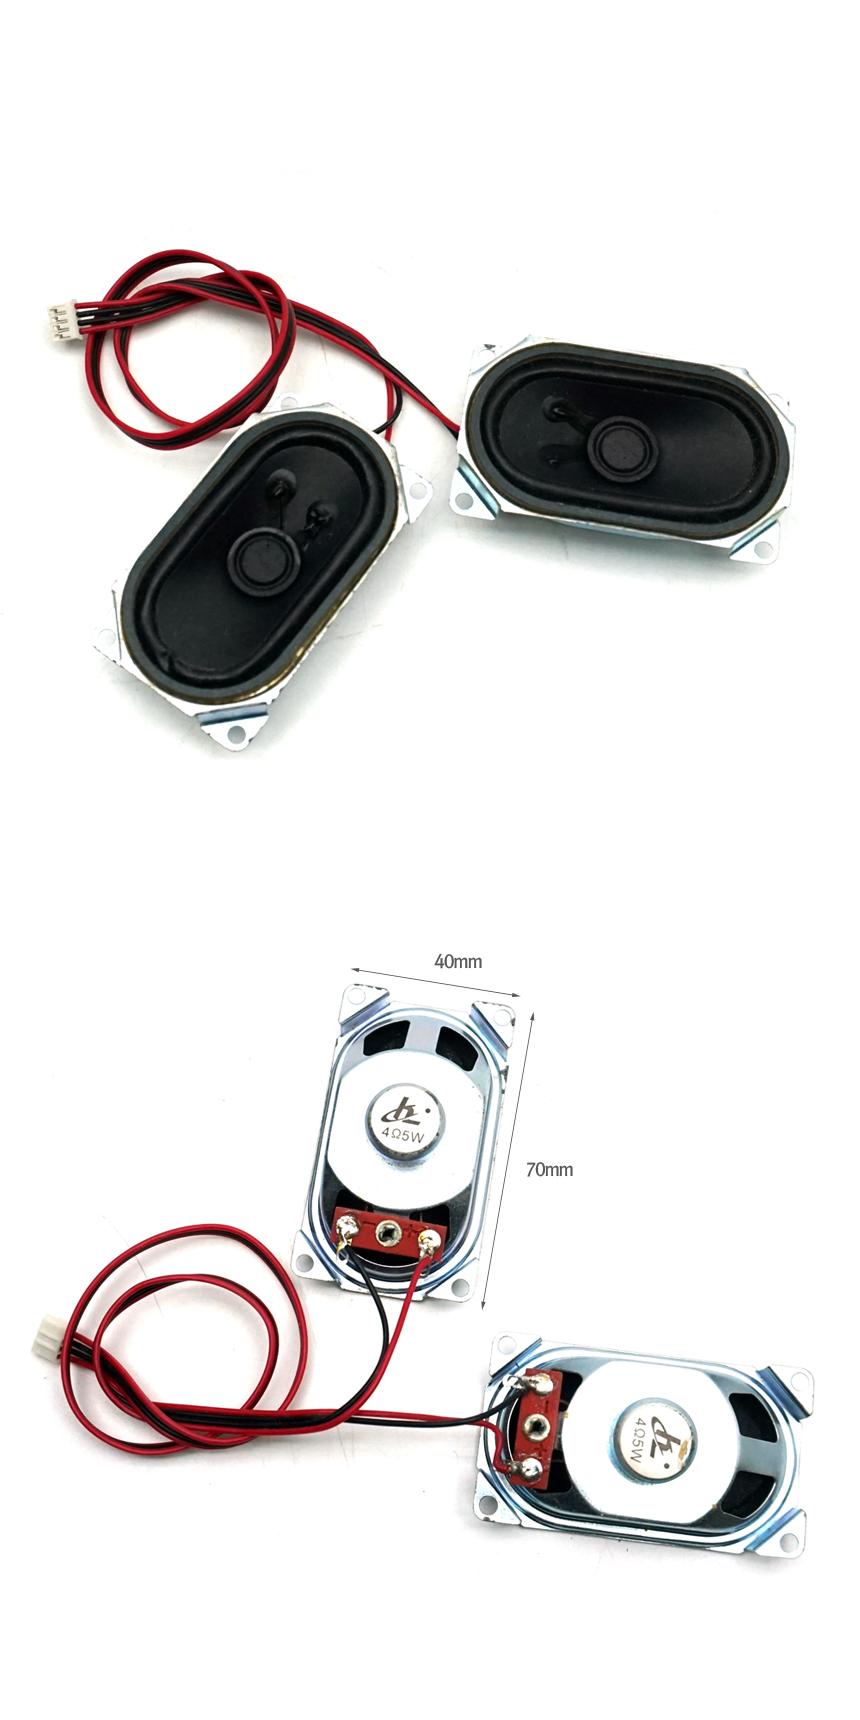 LCD DIY용 5W 4Ω(4옴) 다이나믹 우퍼콘지 고출력 스피커 70x40mm